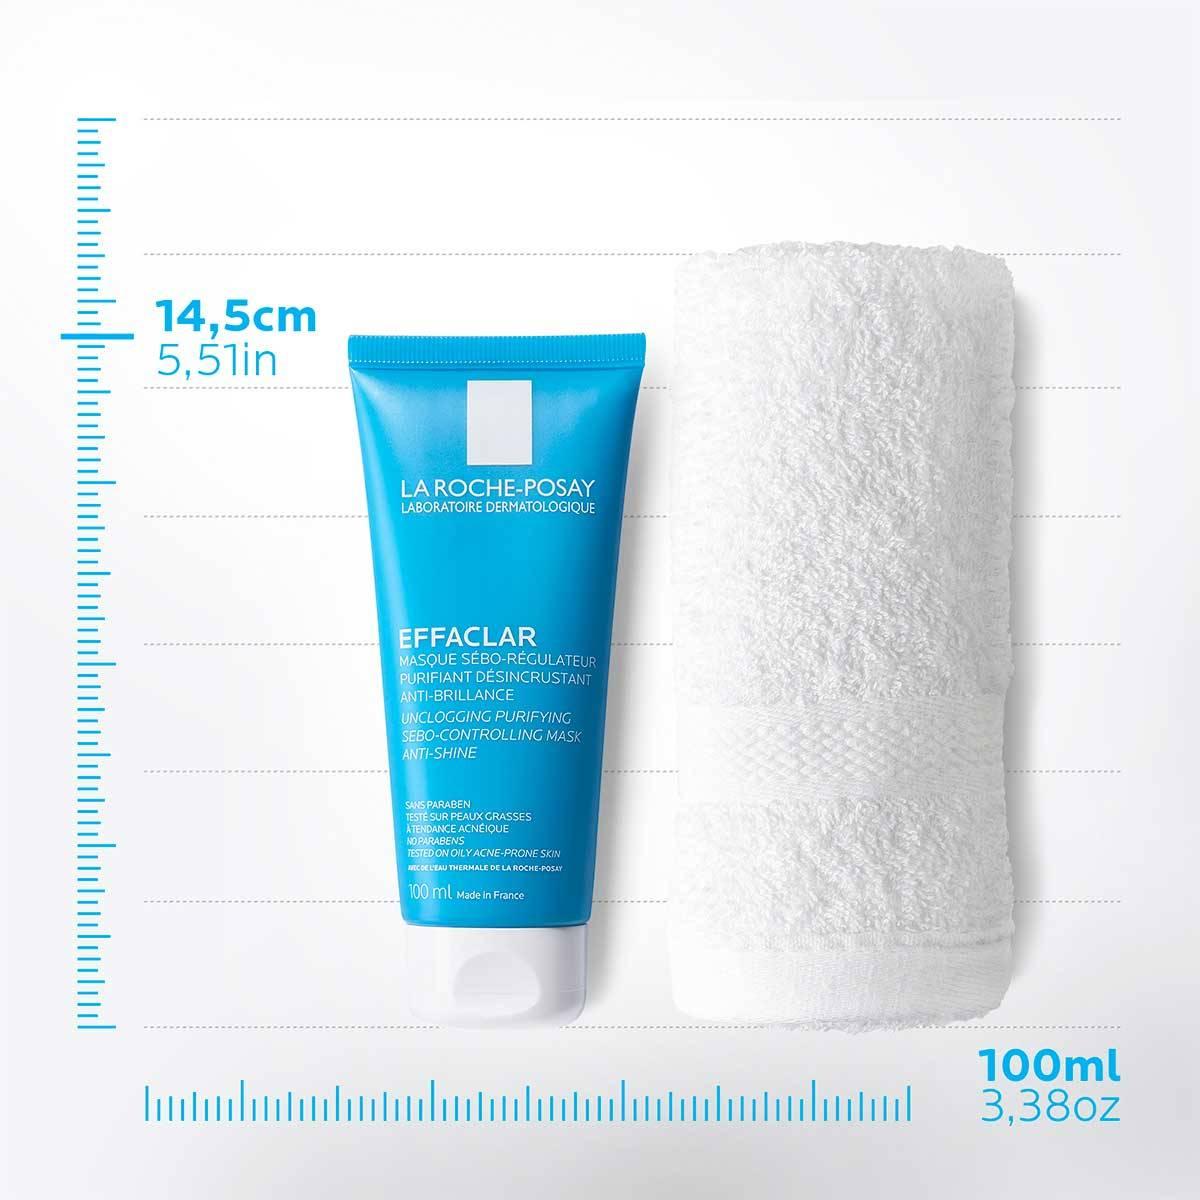 La Roche Posay ProductPage Acne Effaclar Sebo Controlling Mask 100ml 3